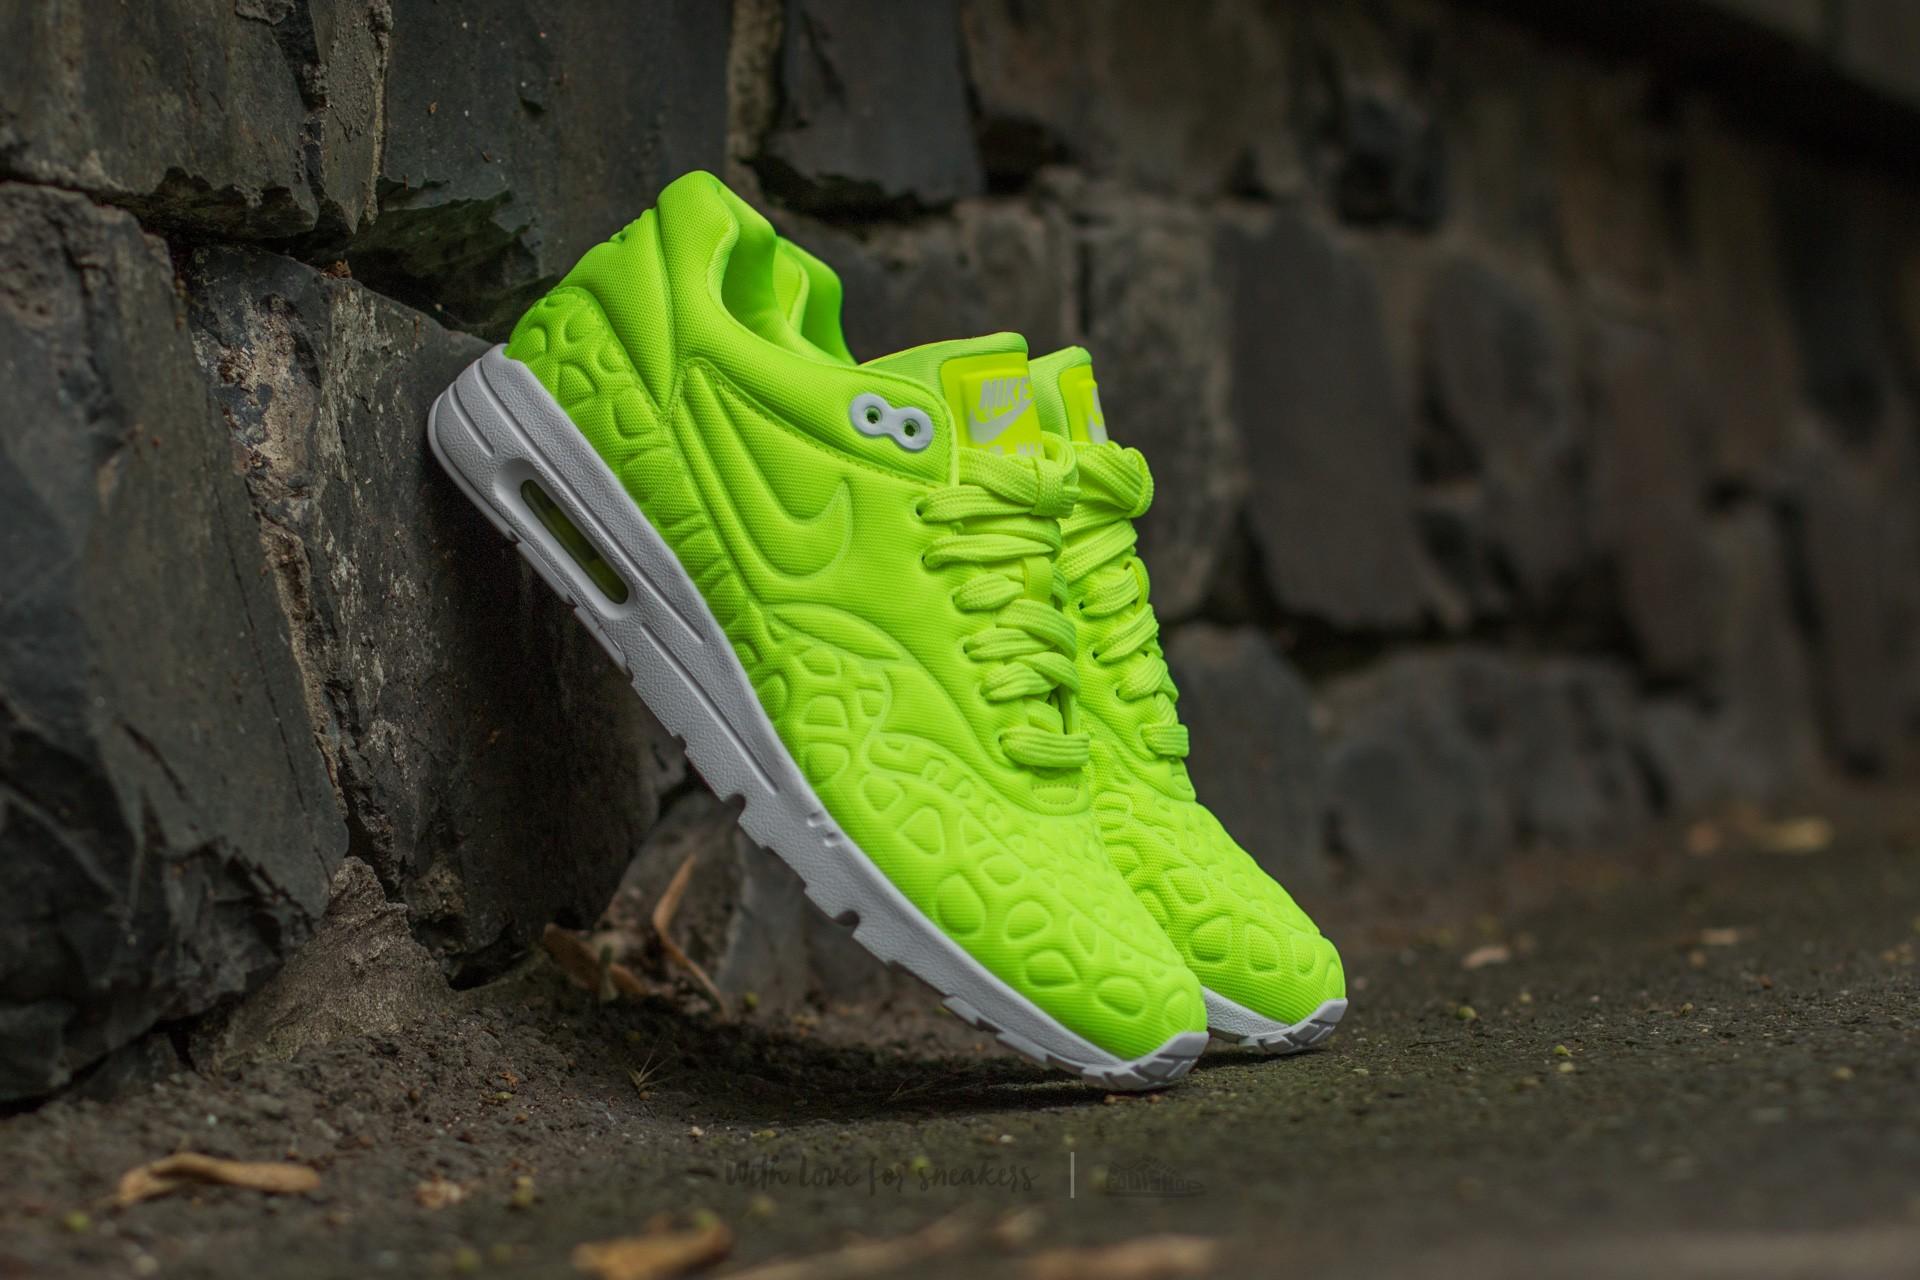 Nike Wmns Air Max 1 Ultra Plush Volt/ Volt-White